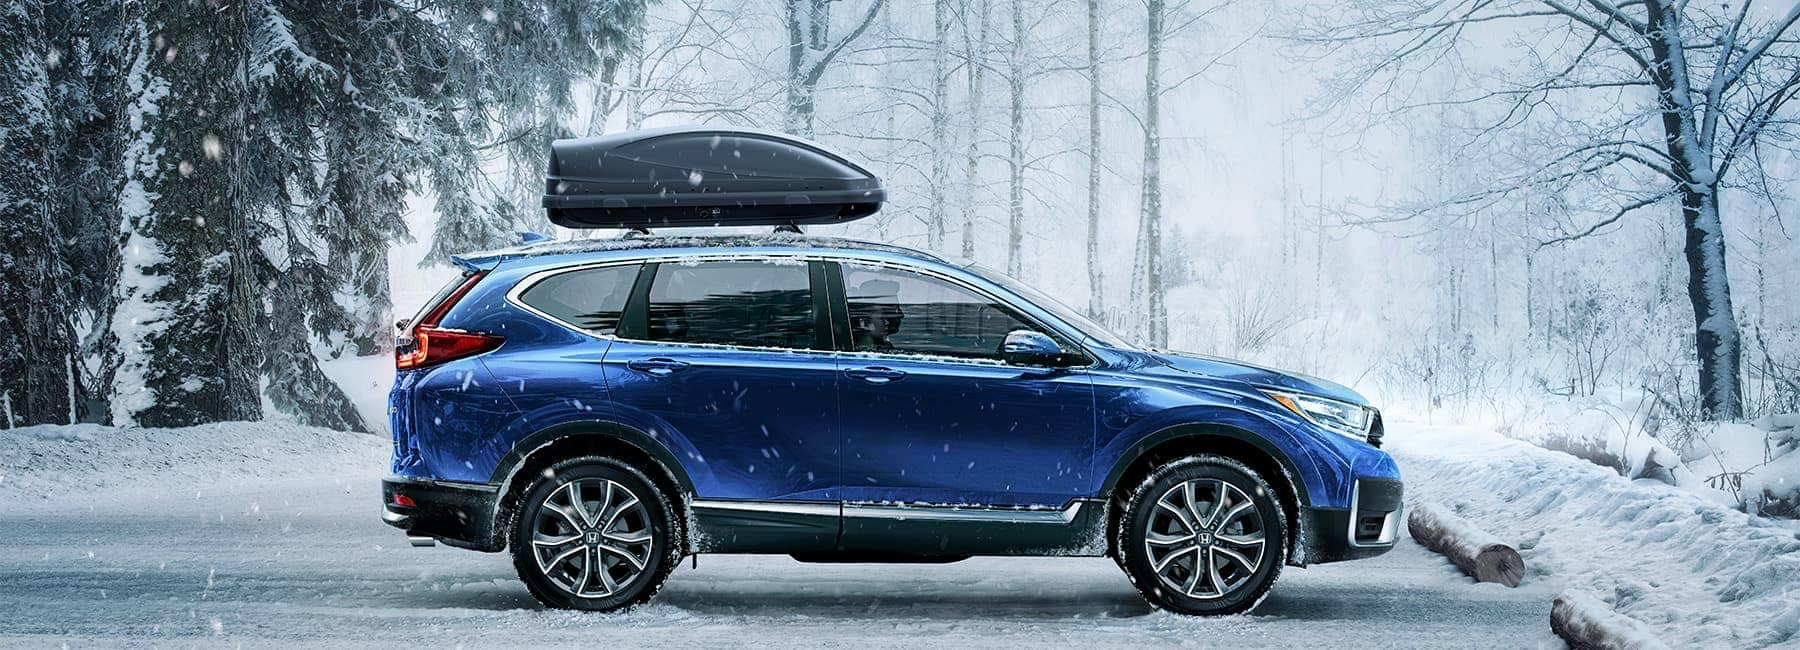 2020-honda-crv-winter-blue-vehicle-parked